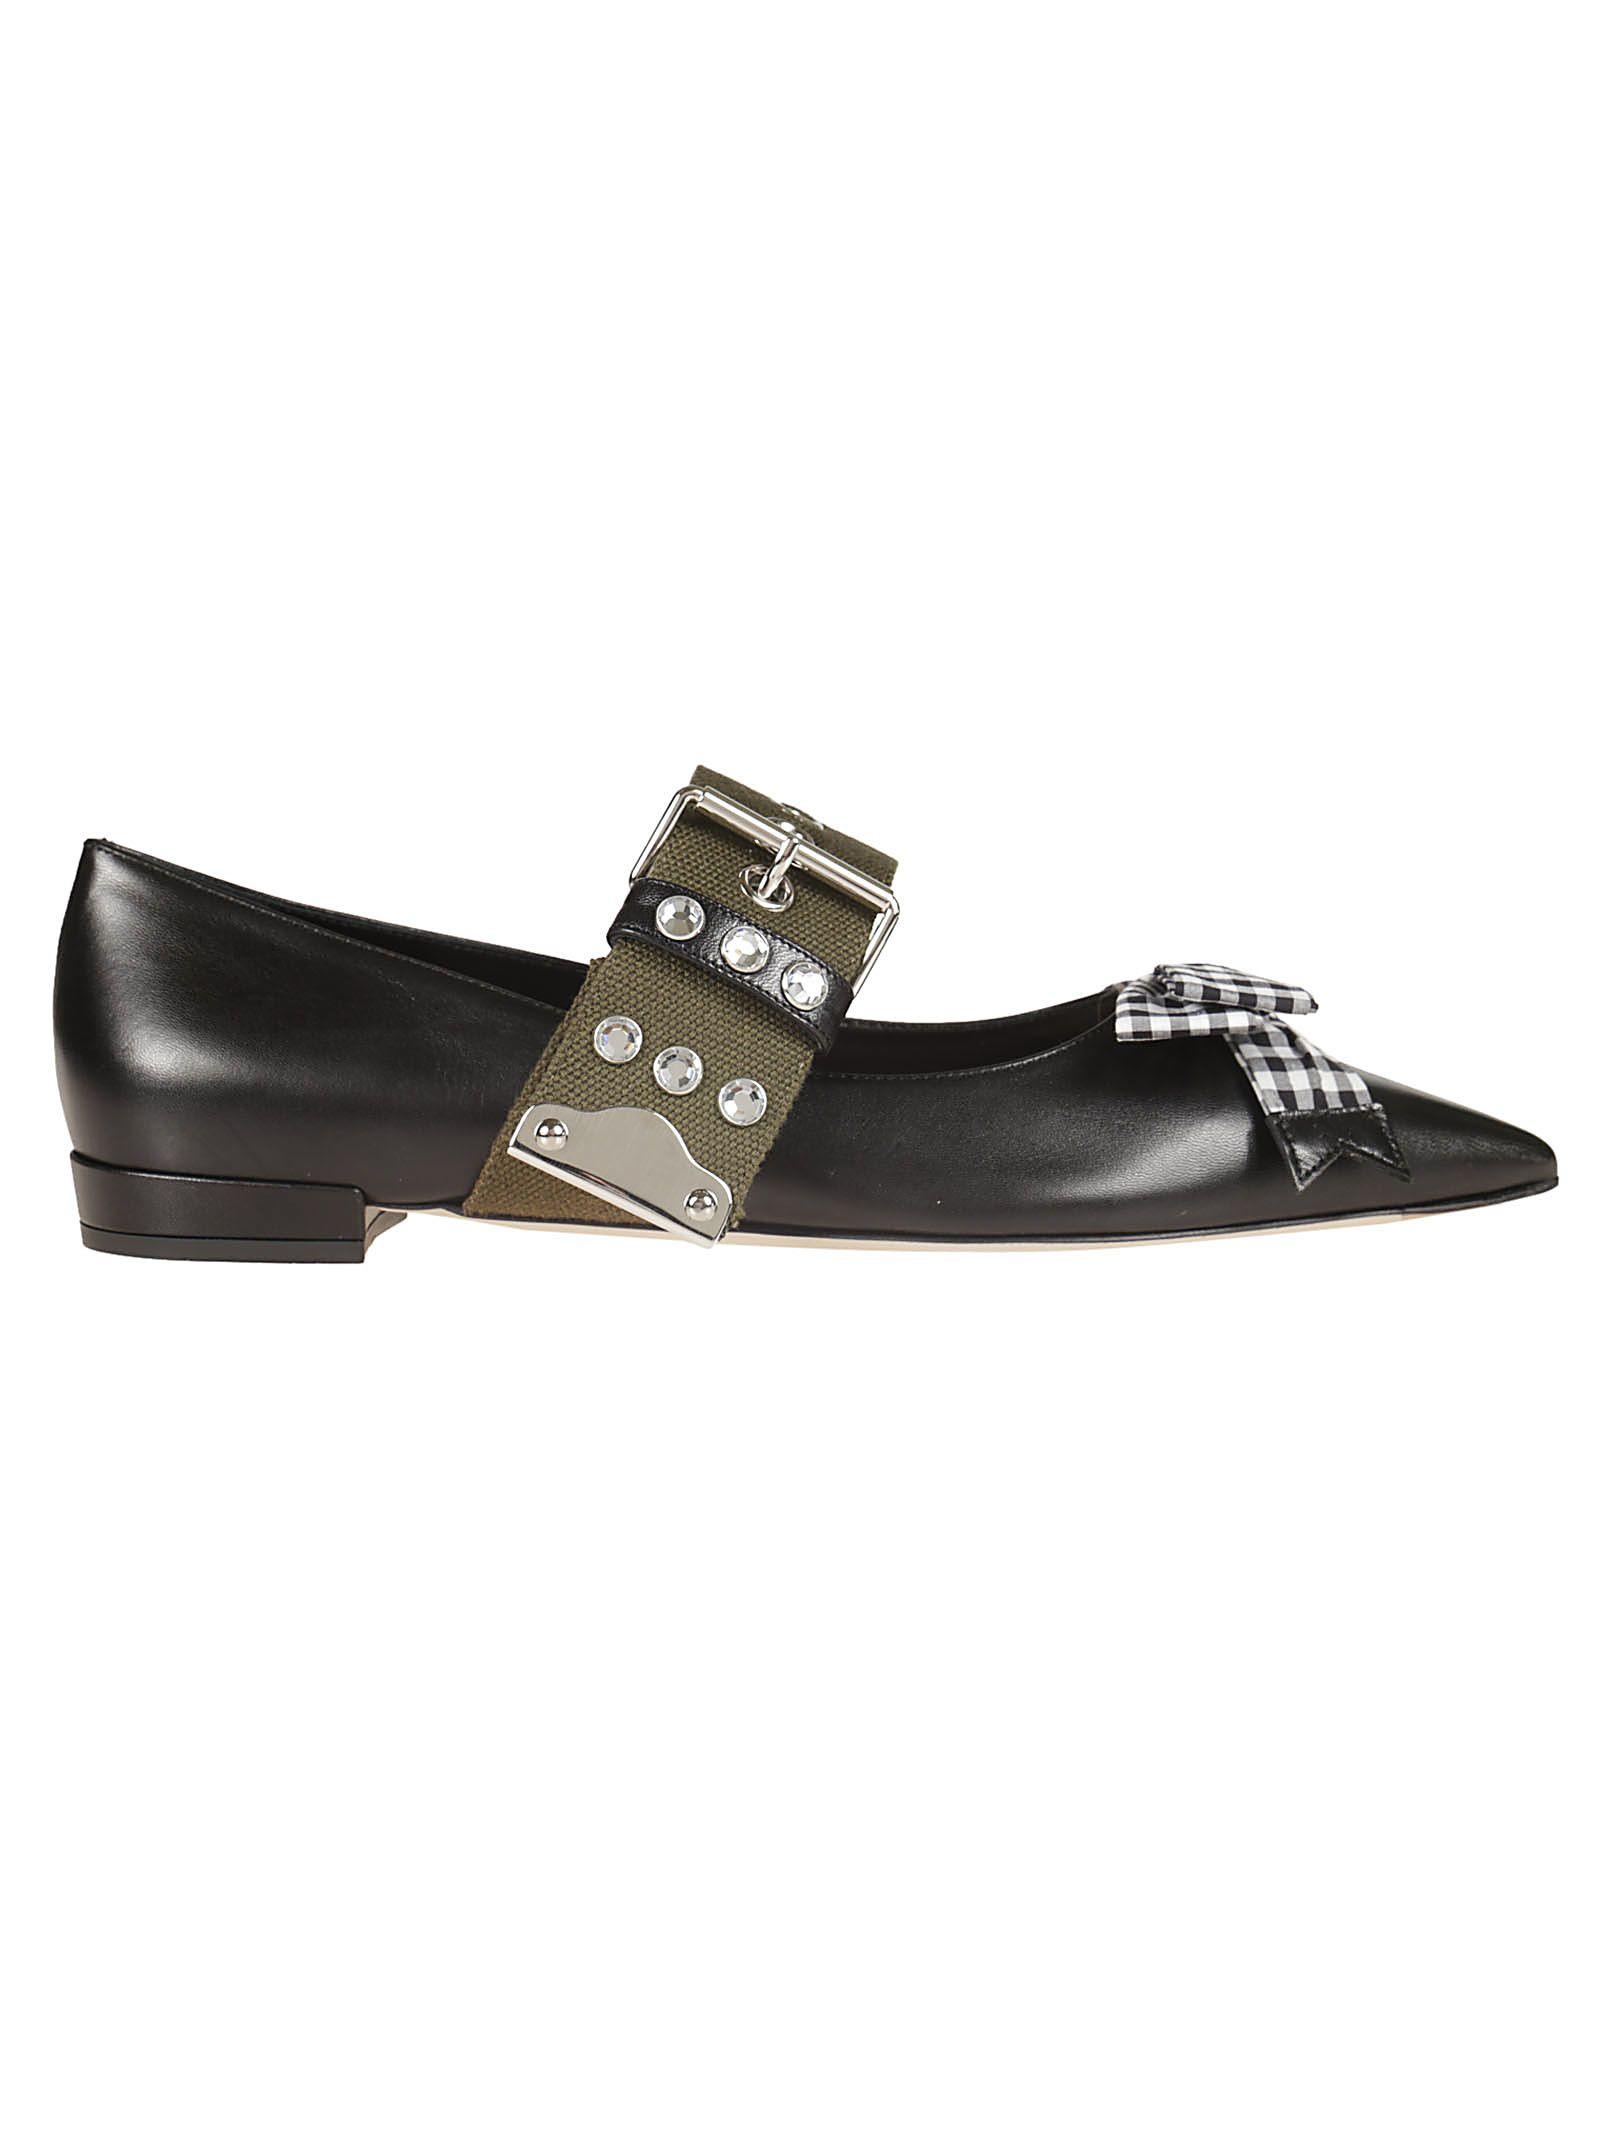 cce0d18be6f Miu Miu Ankle Belt Strap Ballerinas - Black ...